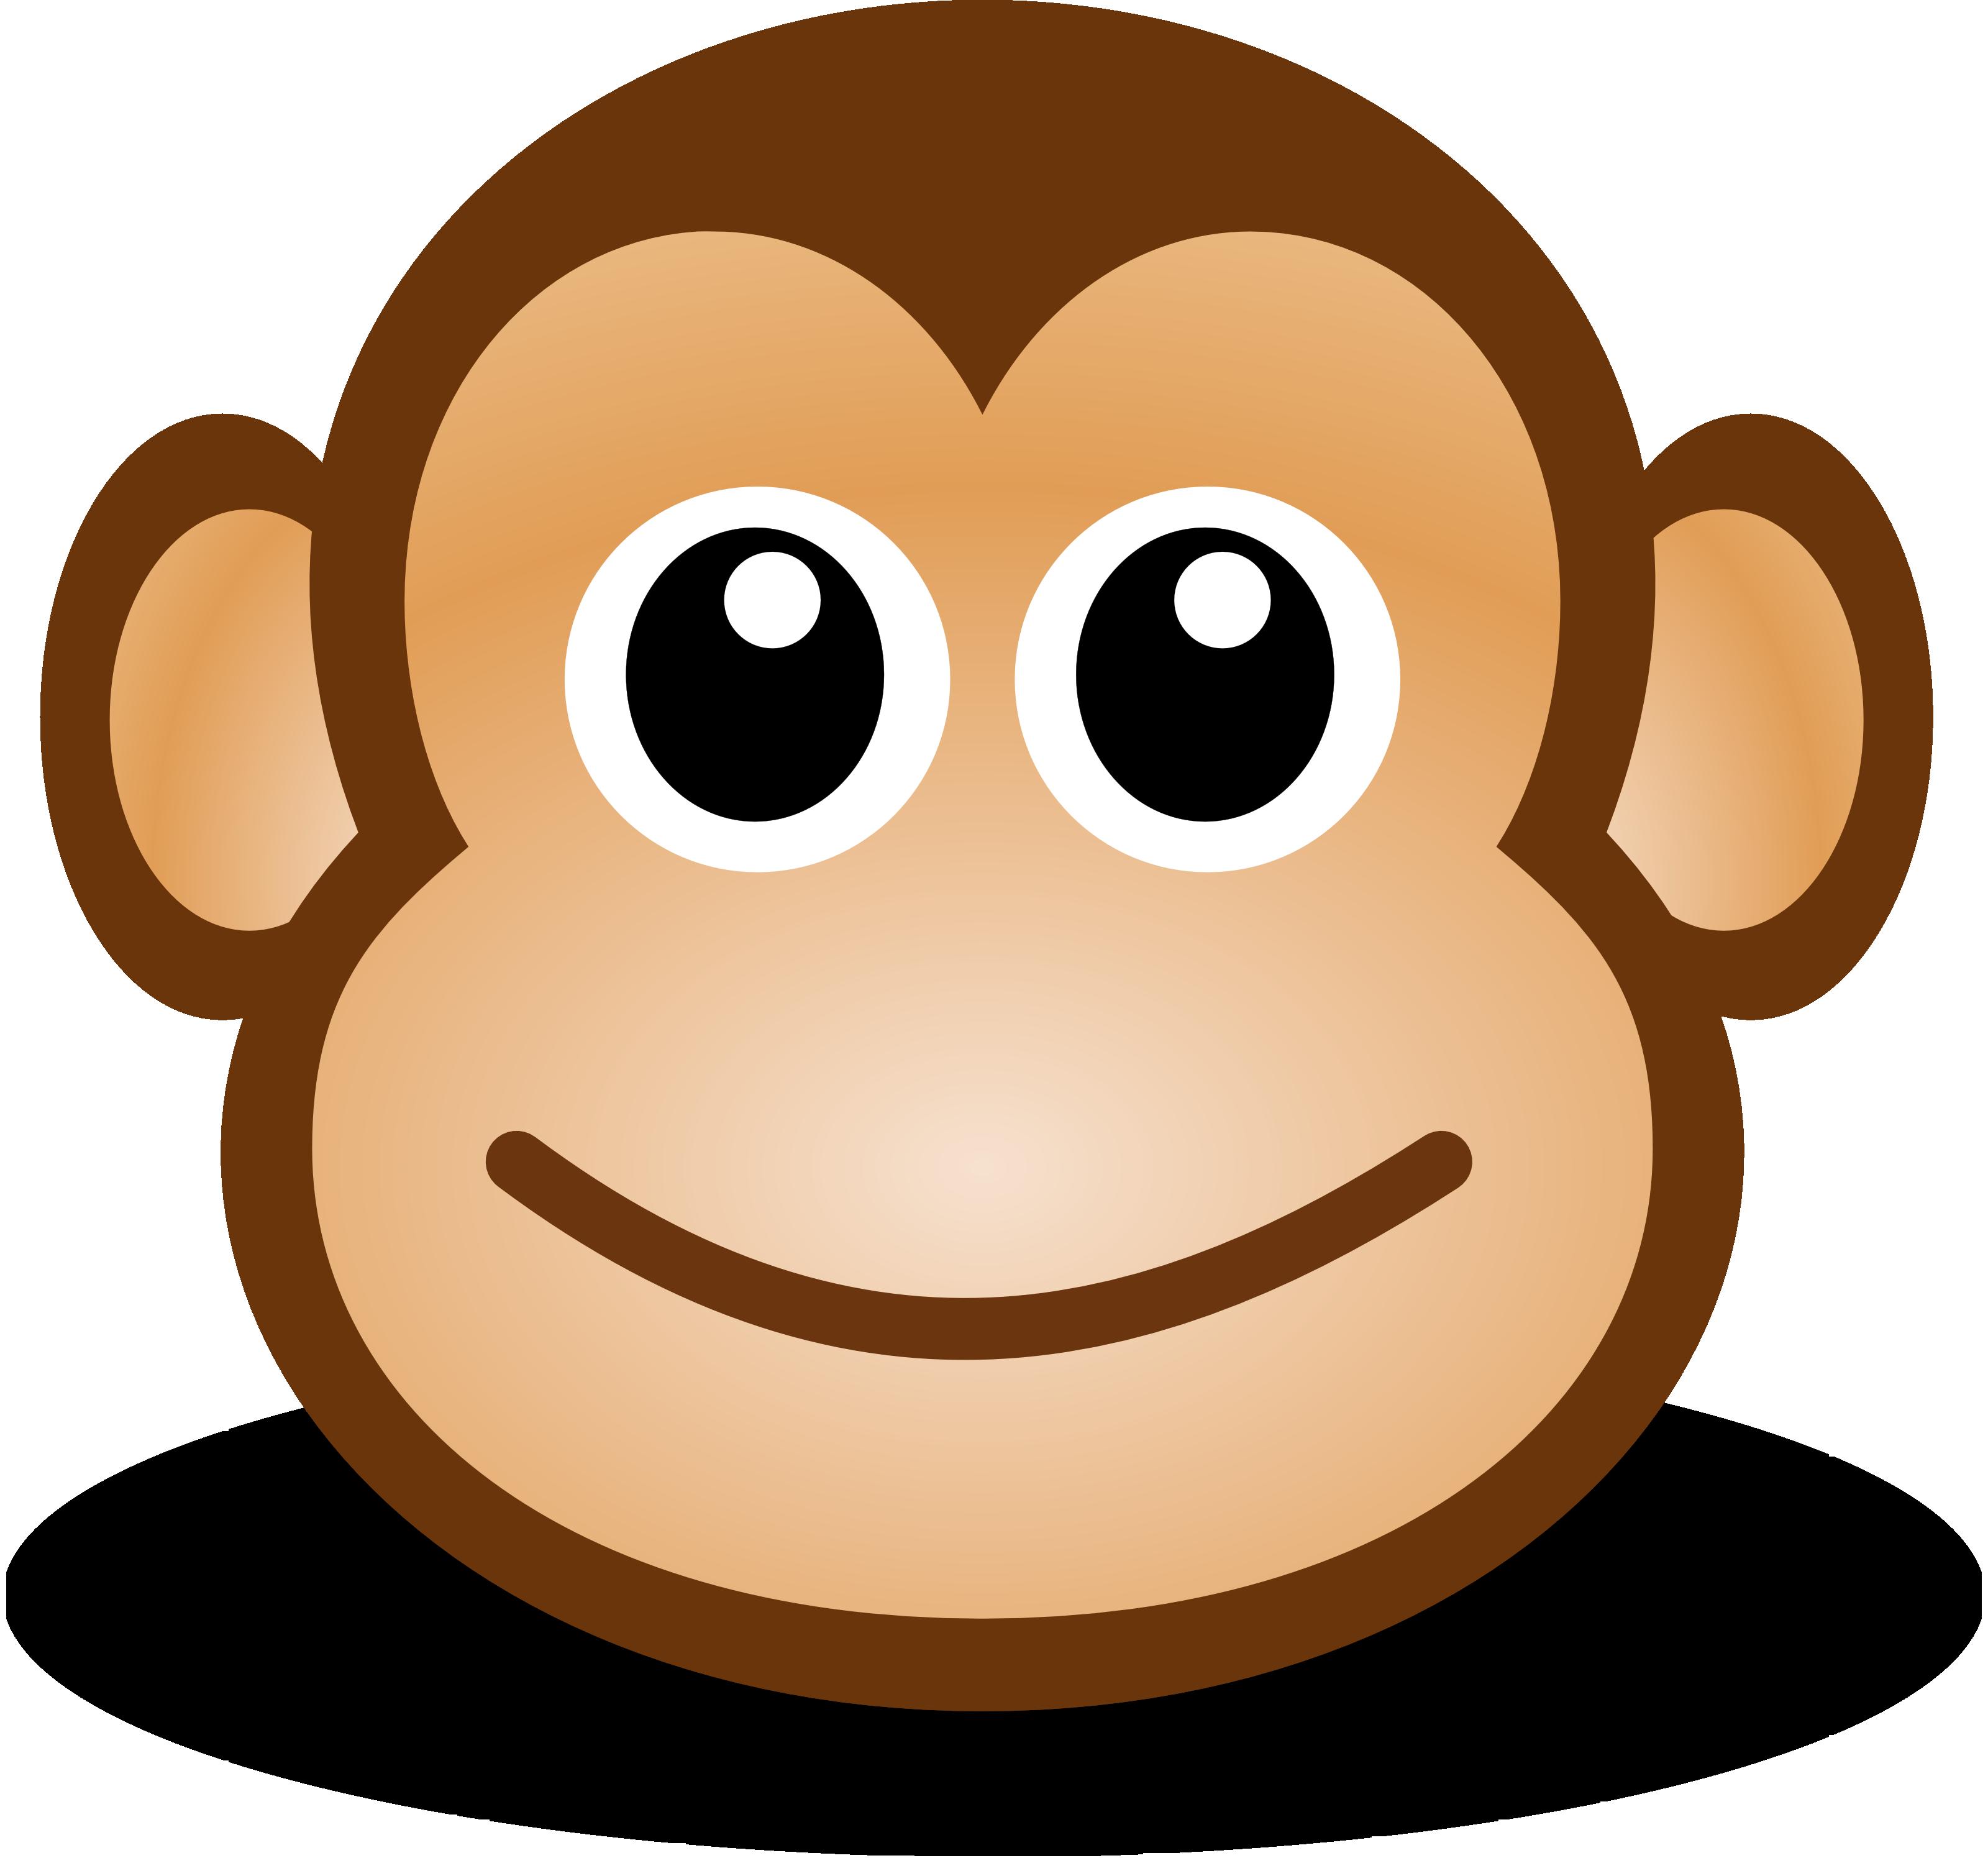 .jpg, .png, .svg,. Free Cute Cartoon Mon-.jpg, .png, .svg,. Free Cute Cartoon Monkey Clipart Illustration-14